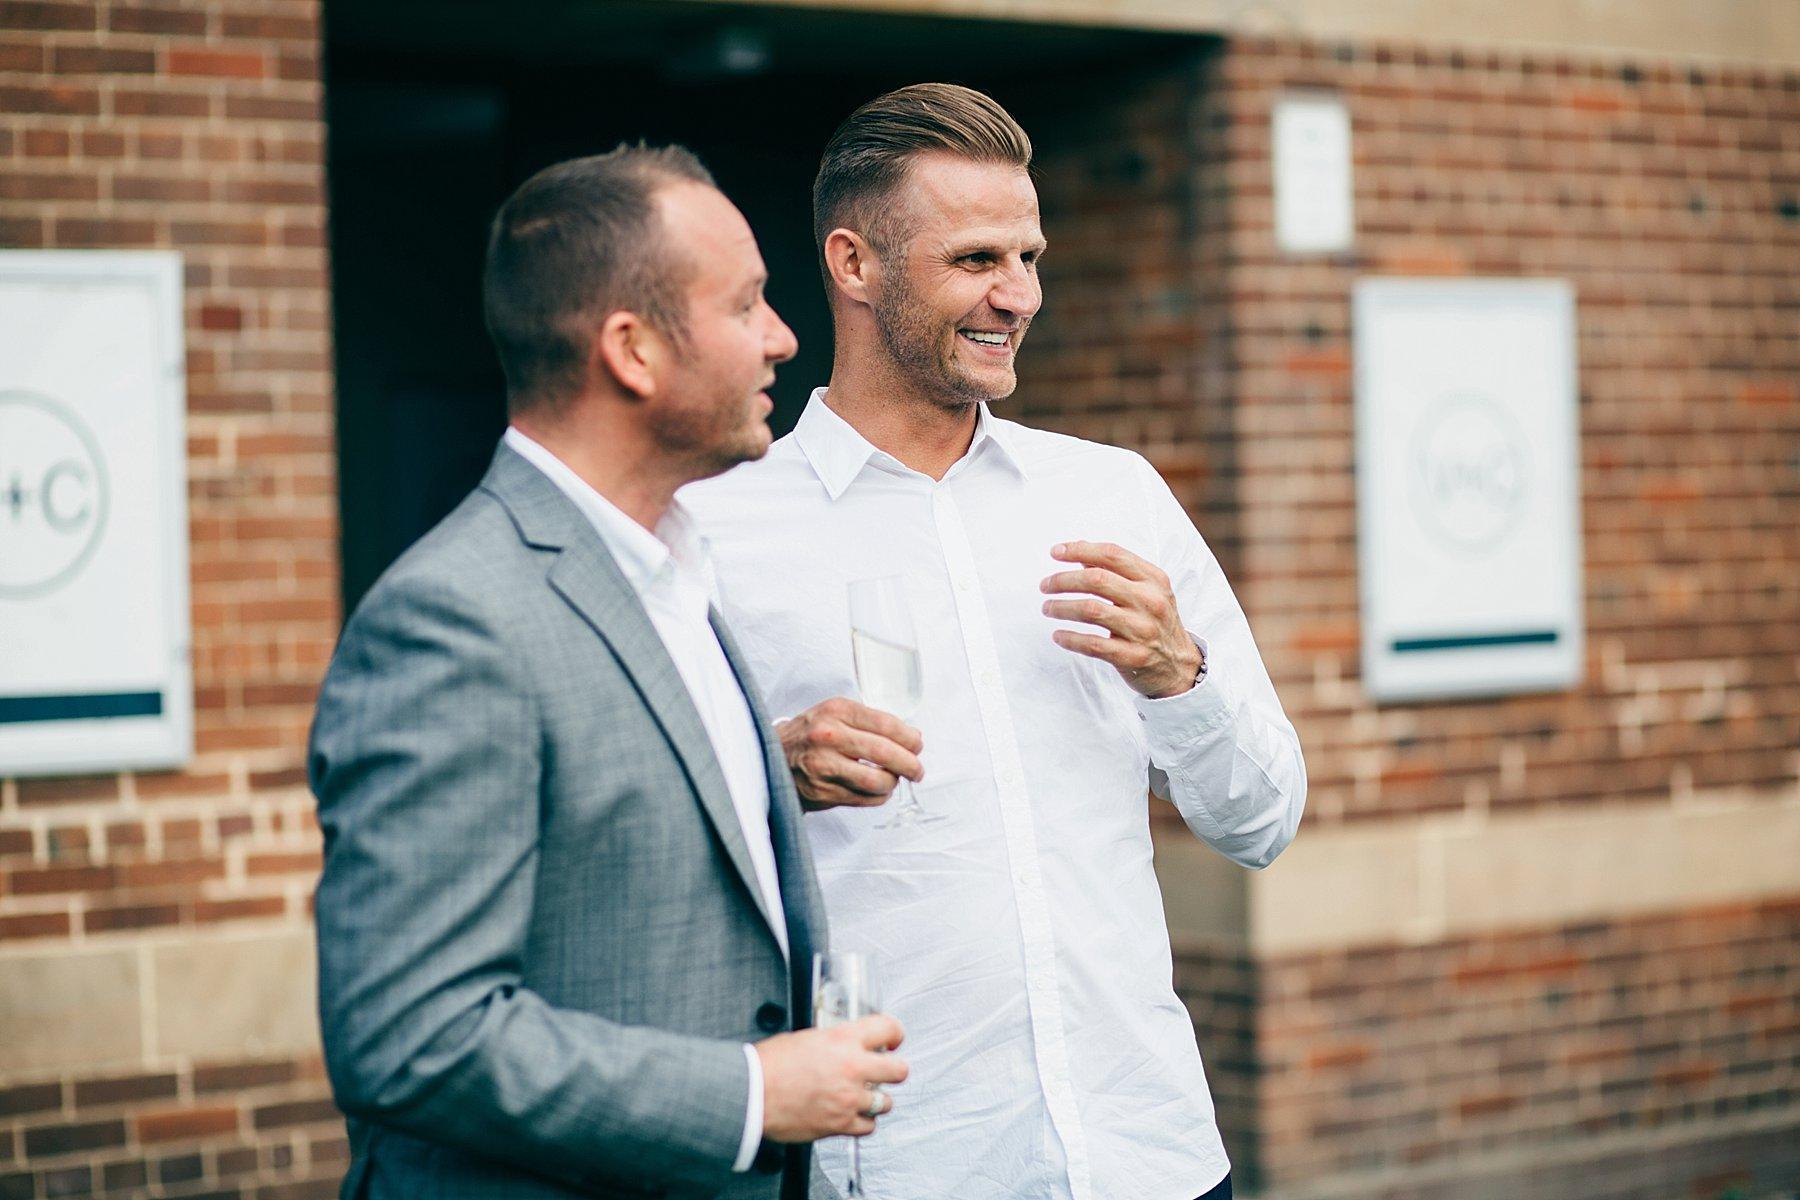 CV-508_Left-Bank-Leeds-alternative-documentary-style-wedding-photographer.jpg